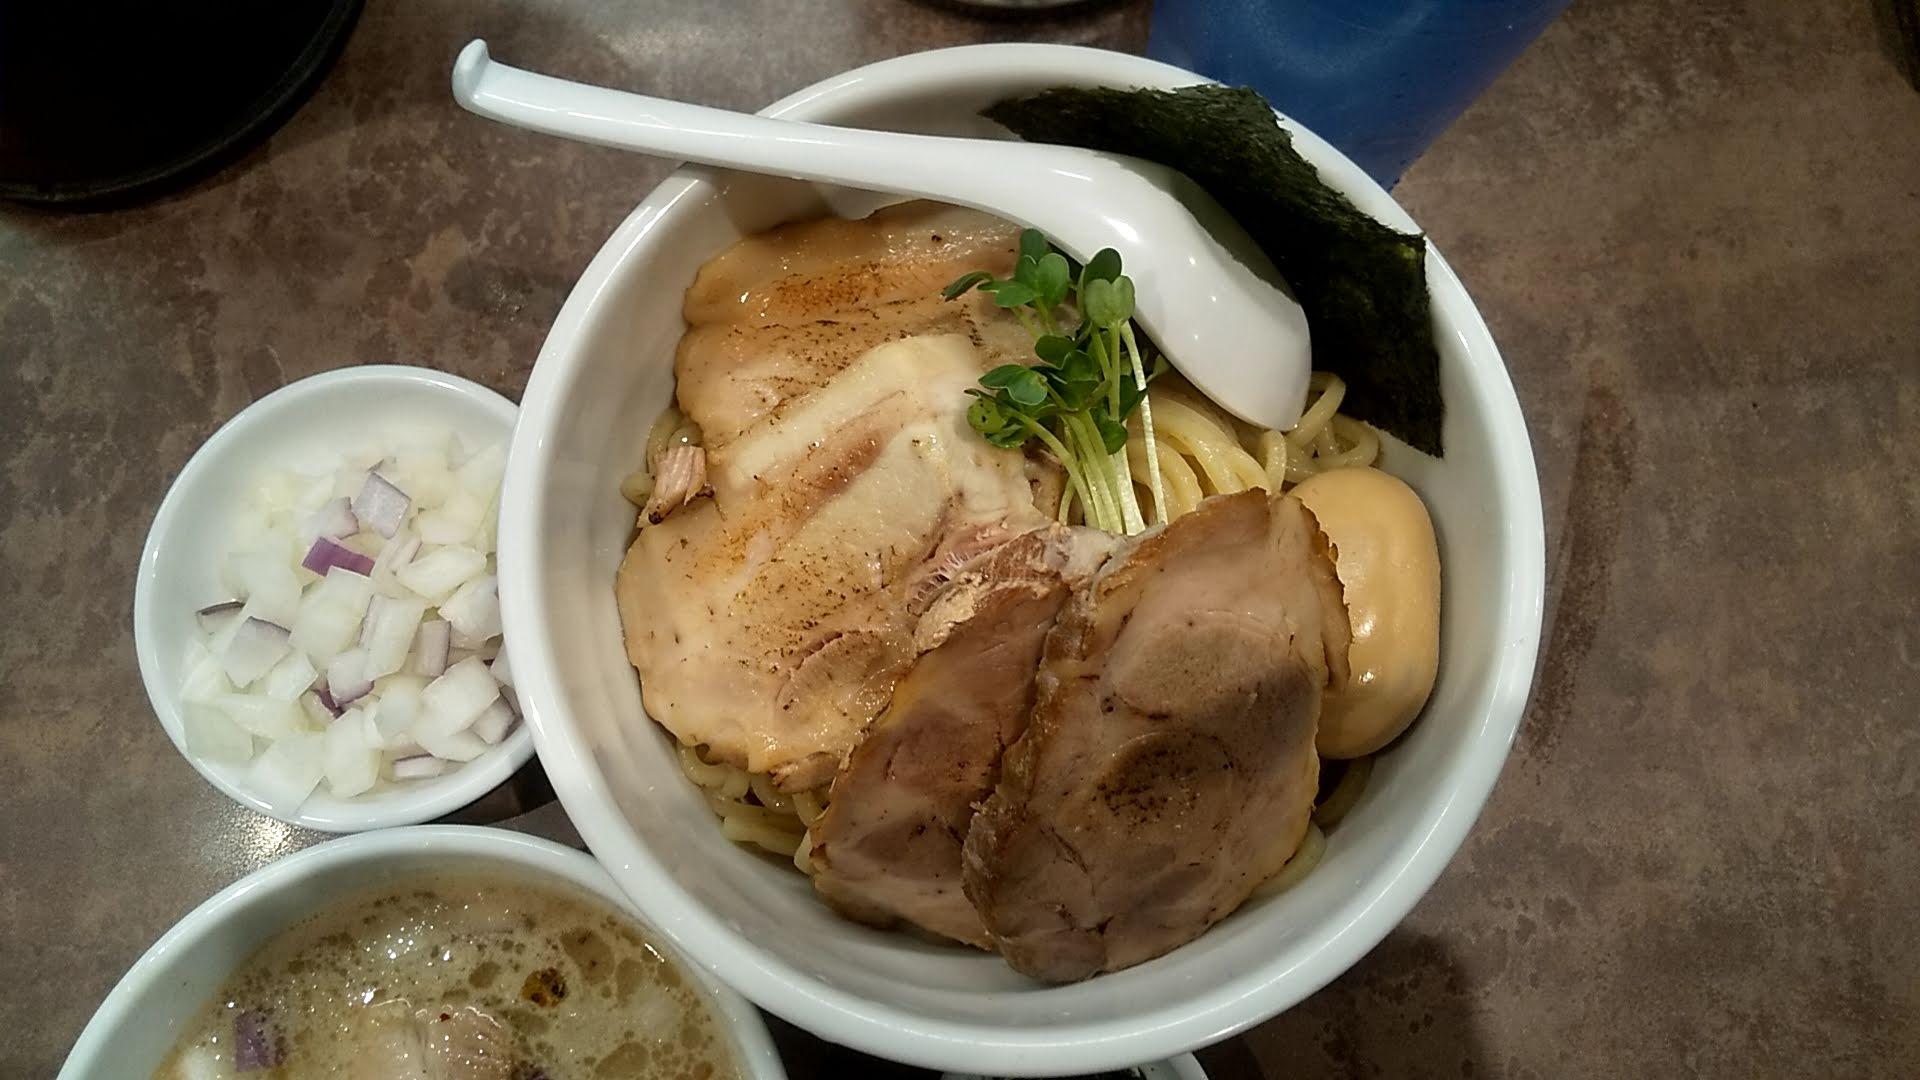 NOODLEVOICEの特製つけ麺の麺皿写真